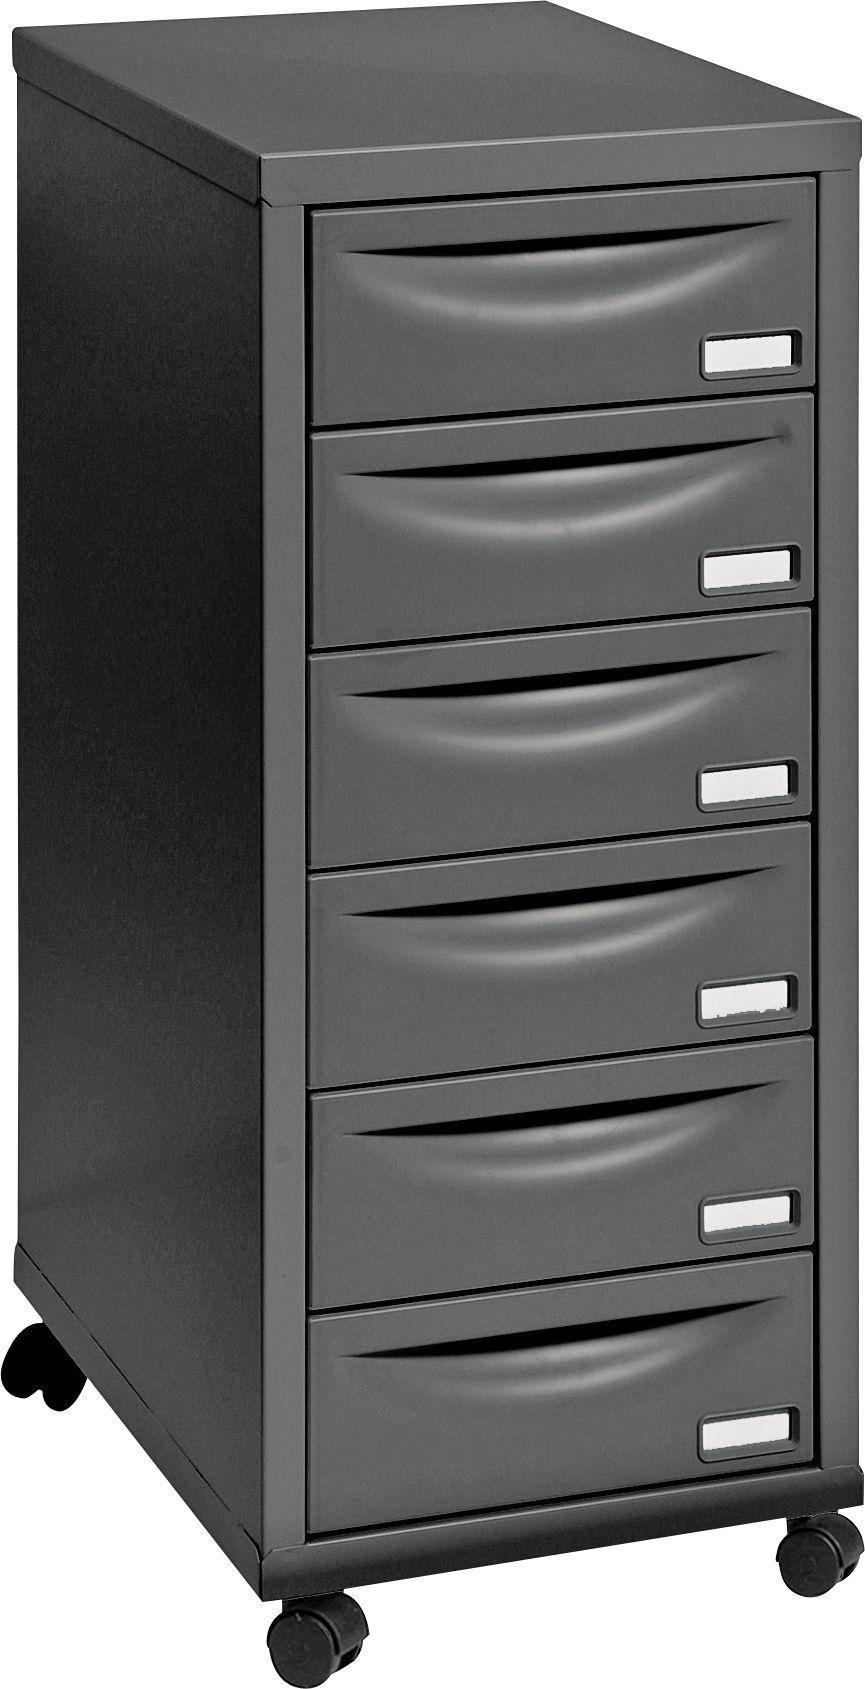 Buy Pierre Henry 6 Drawer Multi Filing Cabinet Black Filing Cabinets